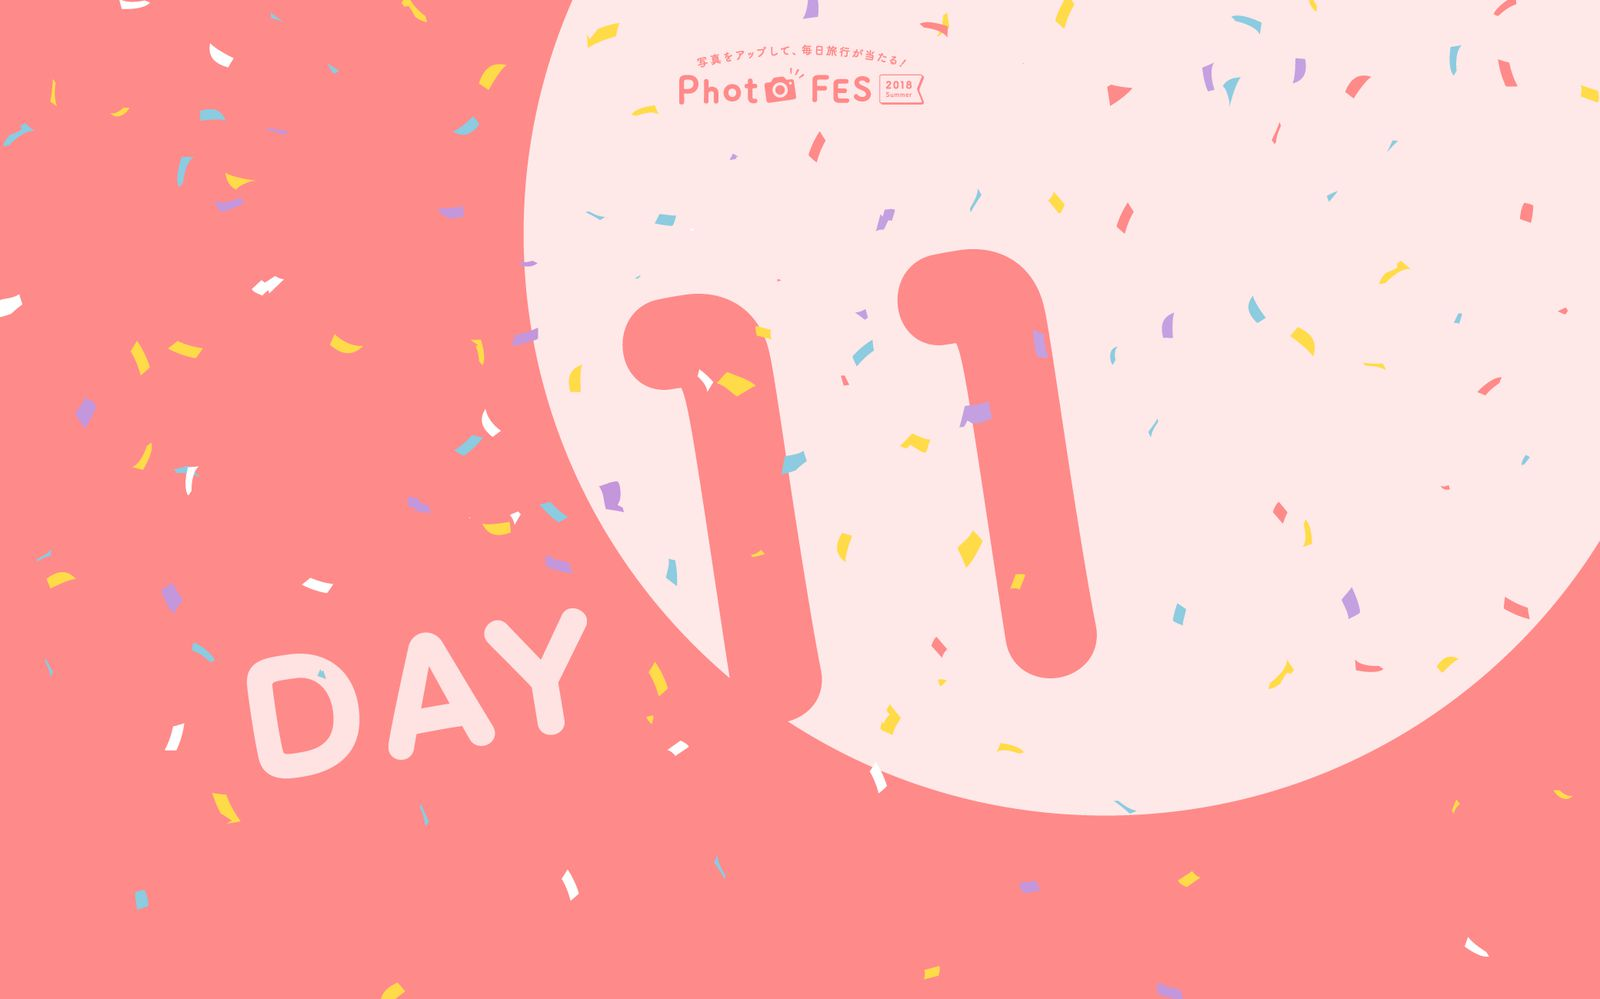 【DAY11】「Photo FES 2018」7月6日投稿分であたる賞品&受賞者発表